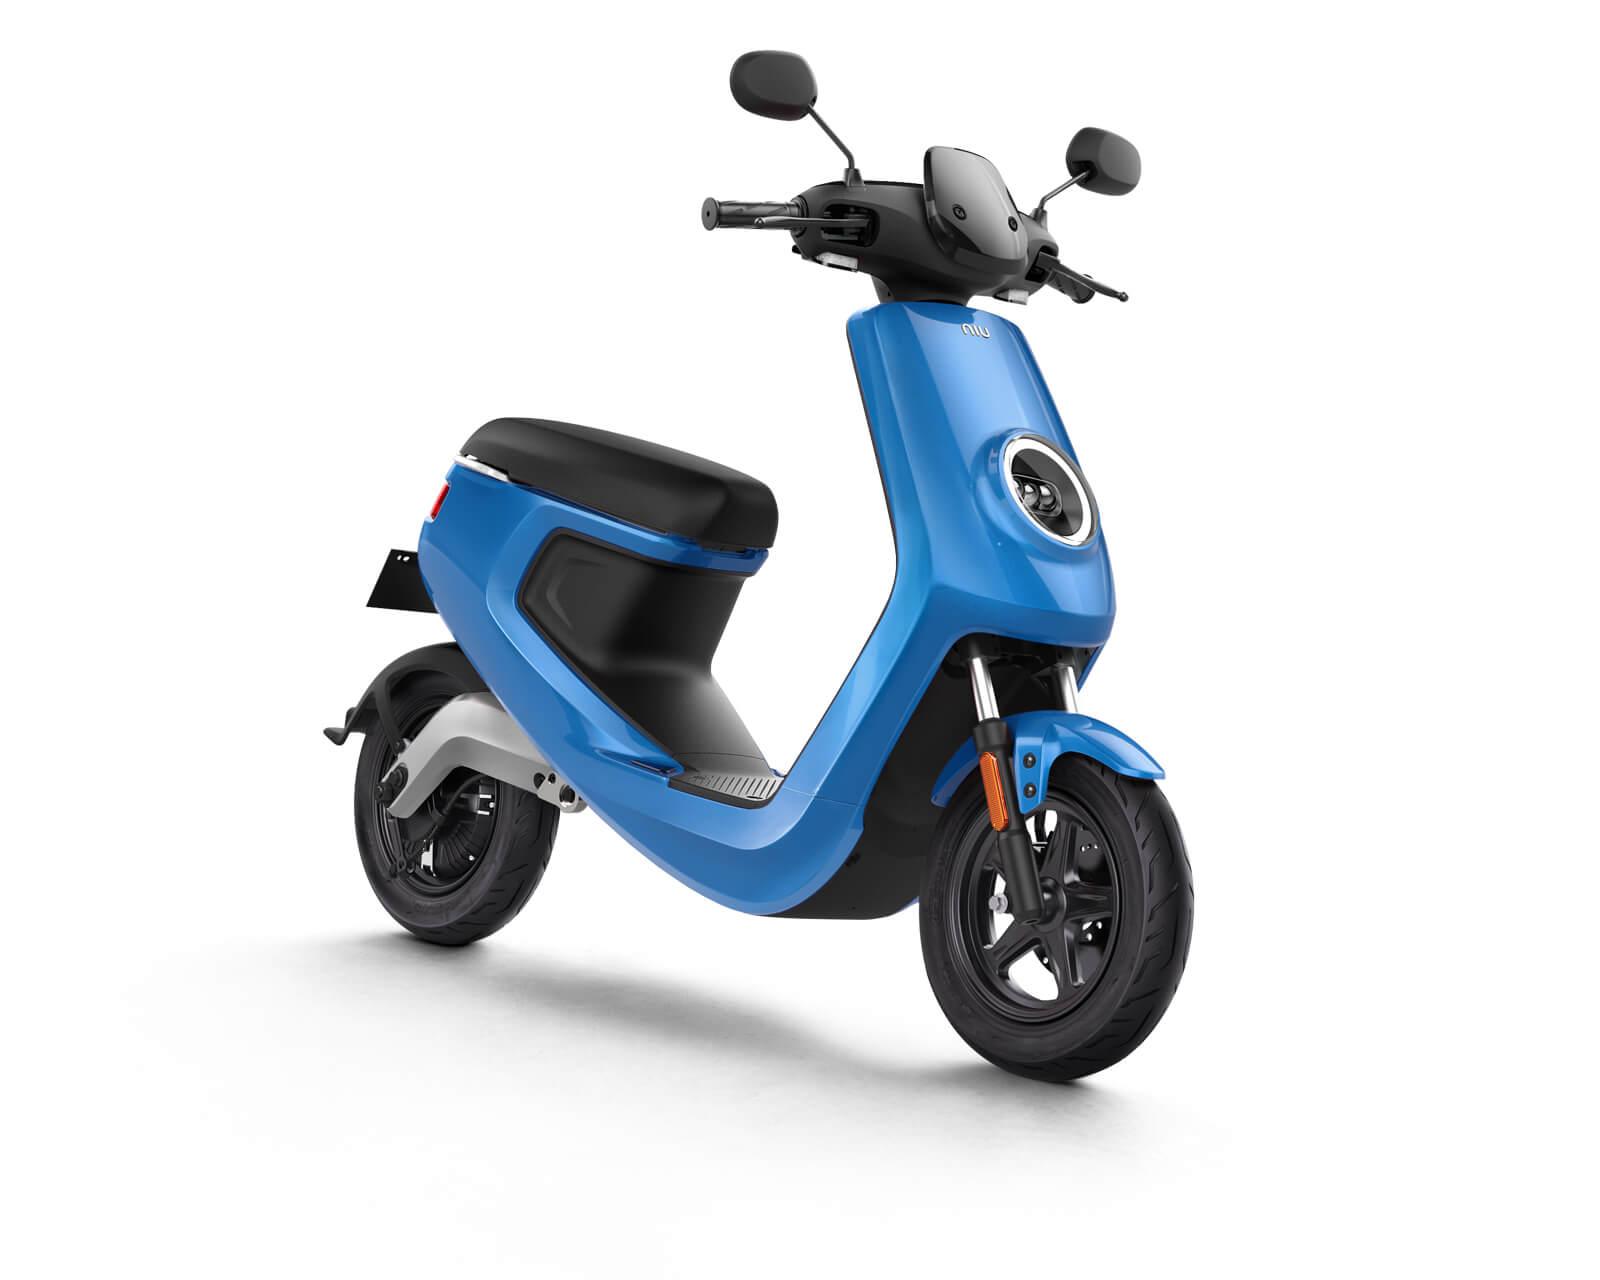 Scooterverhuur Veluwe